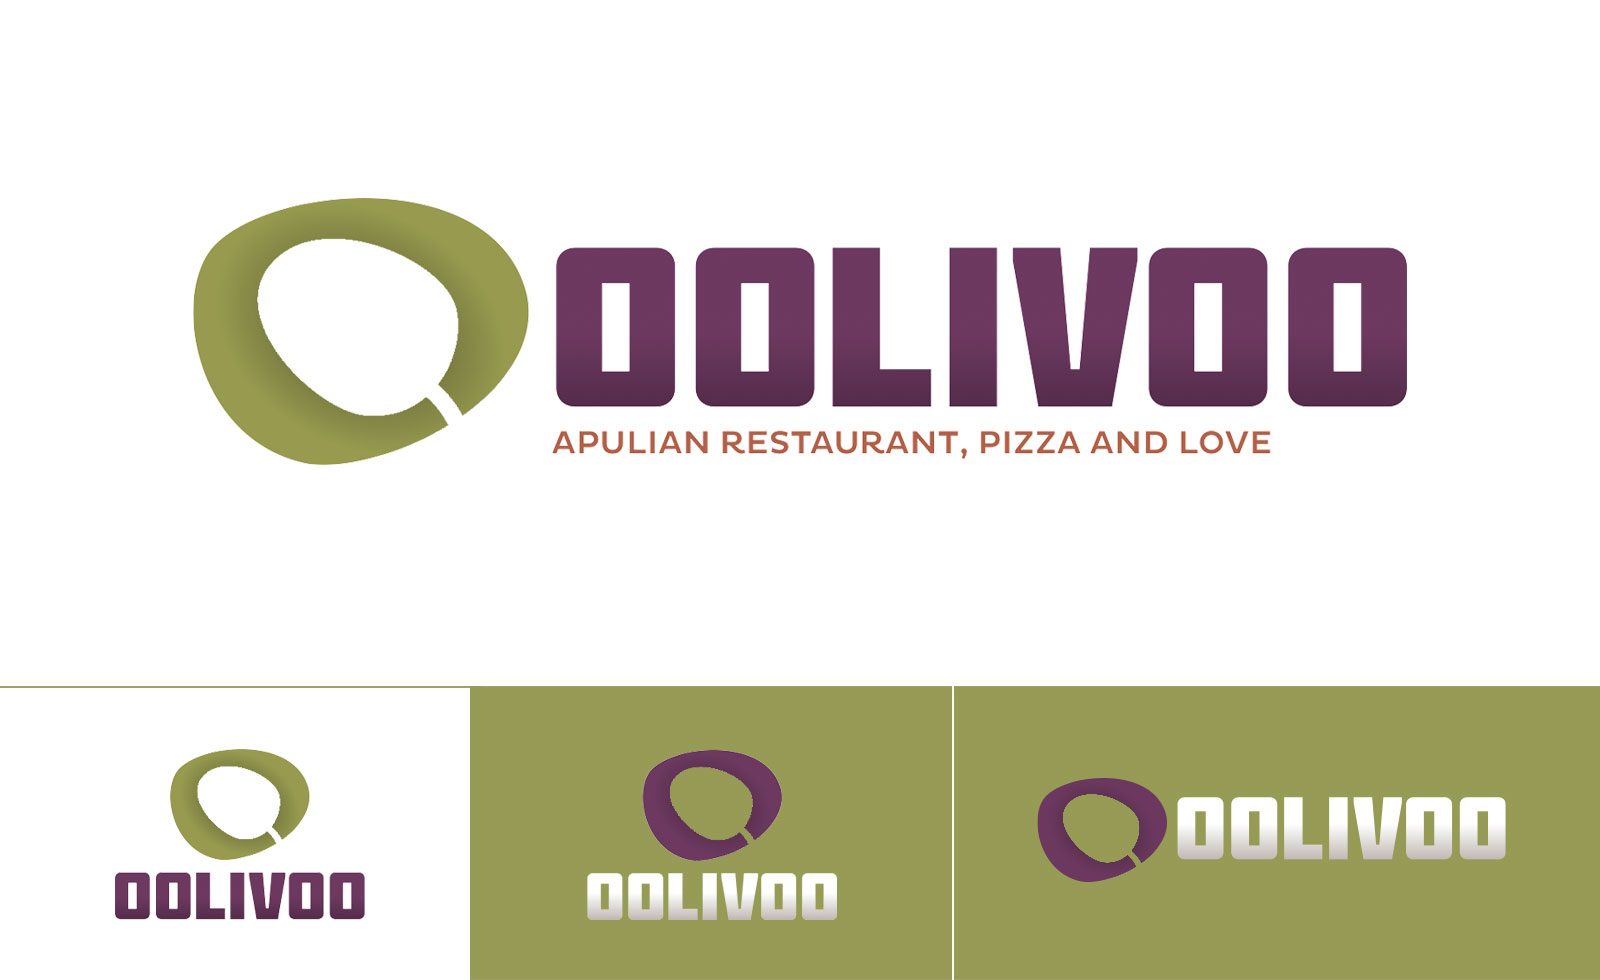 oolivoo pizza restaurant brand logo identity